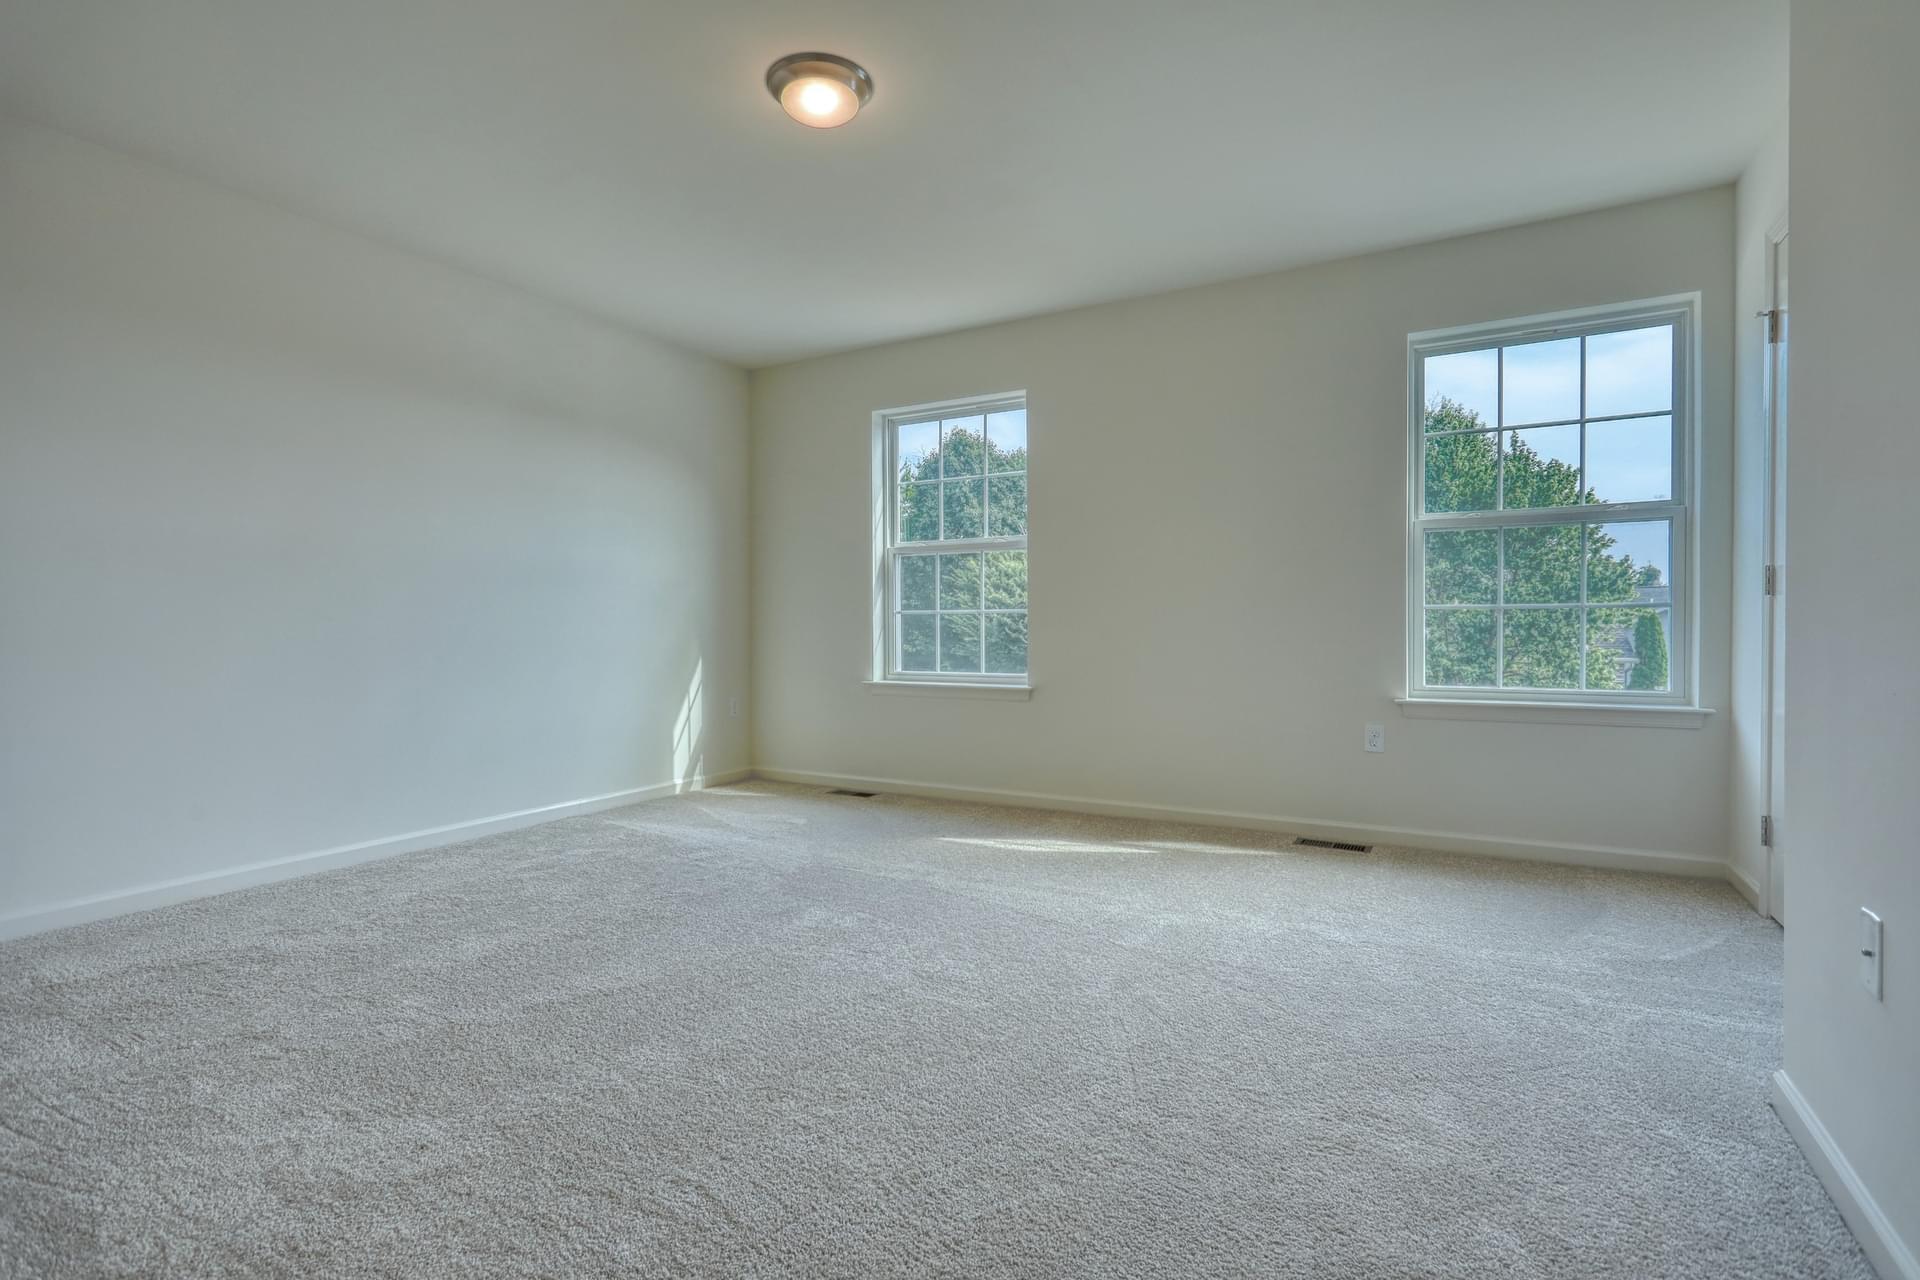 1,819sf New Home in Mechanicsburg, PA